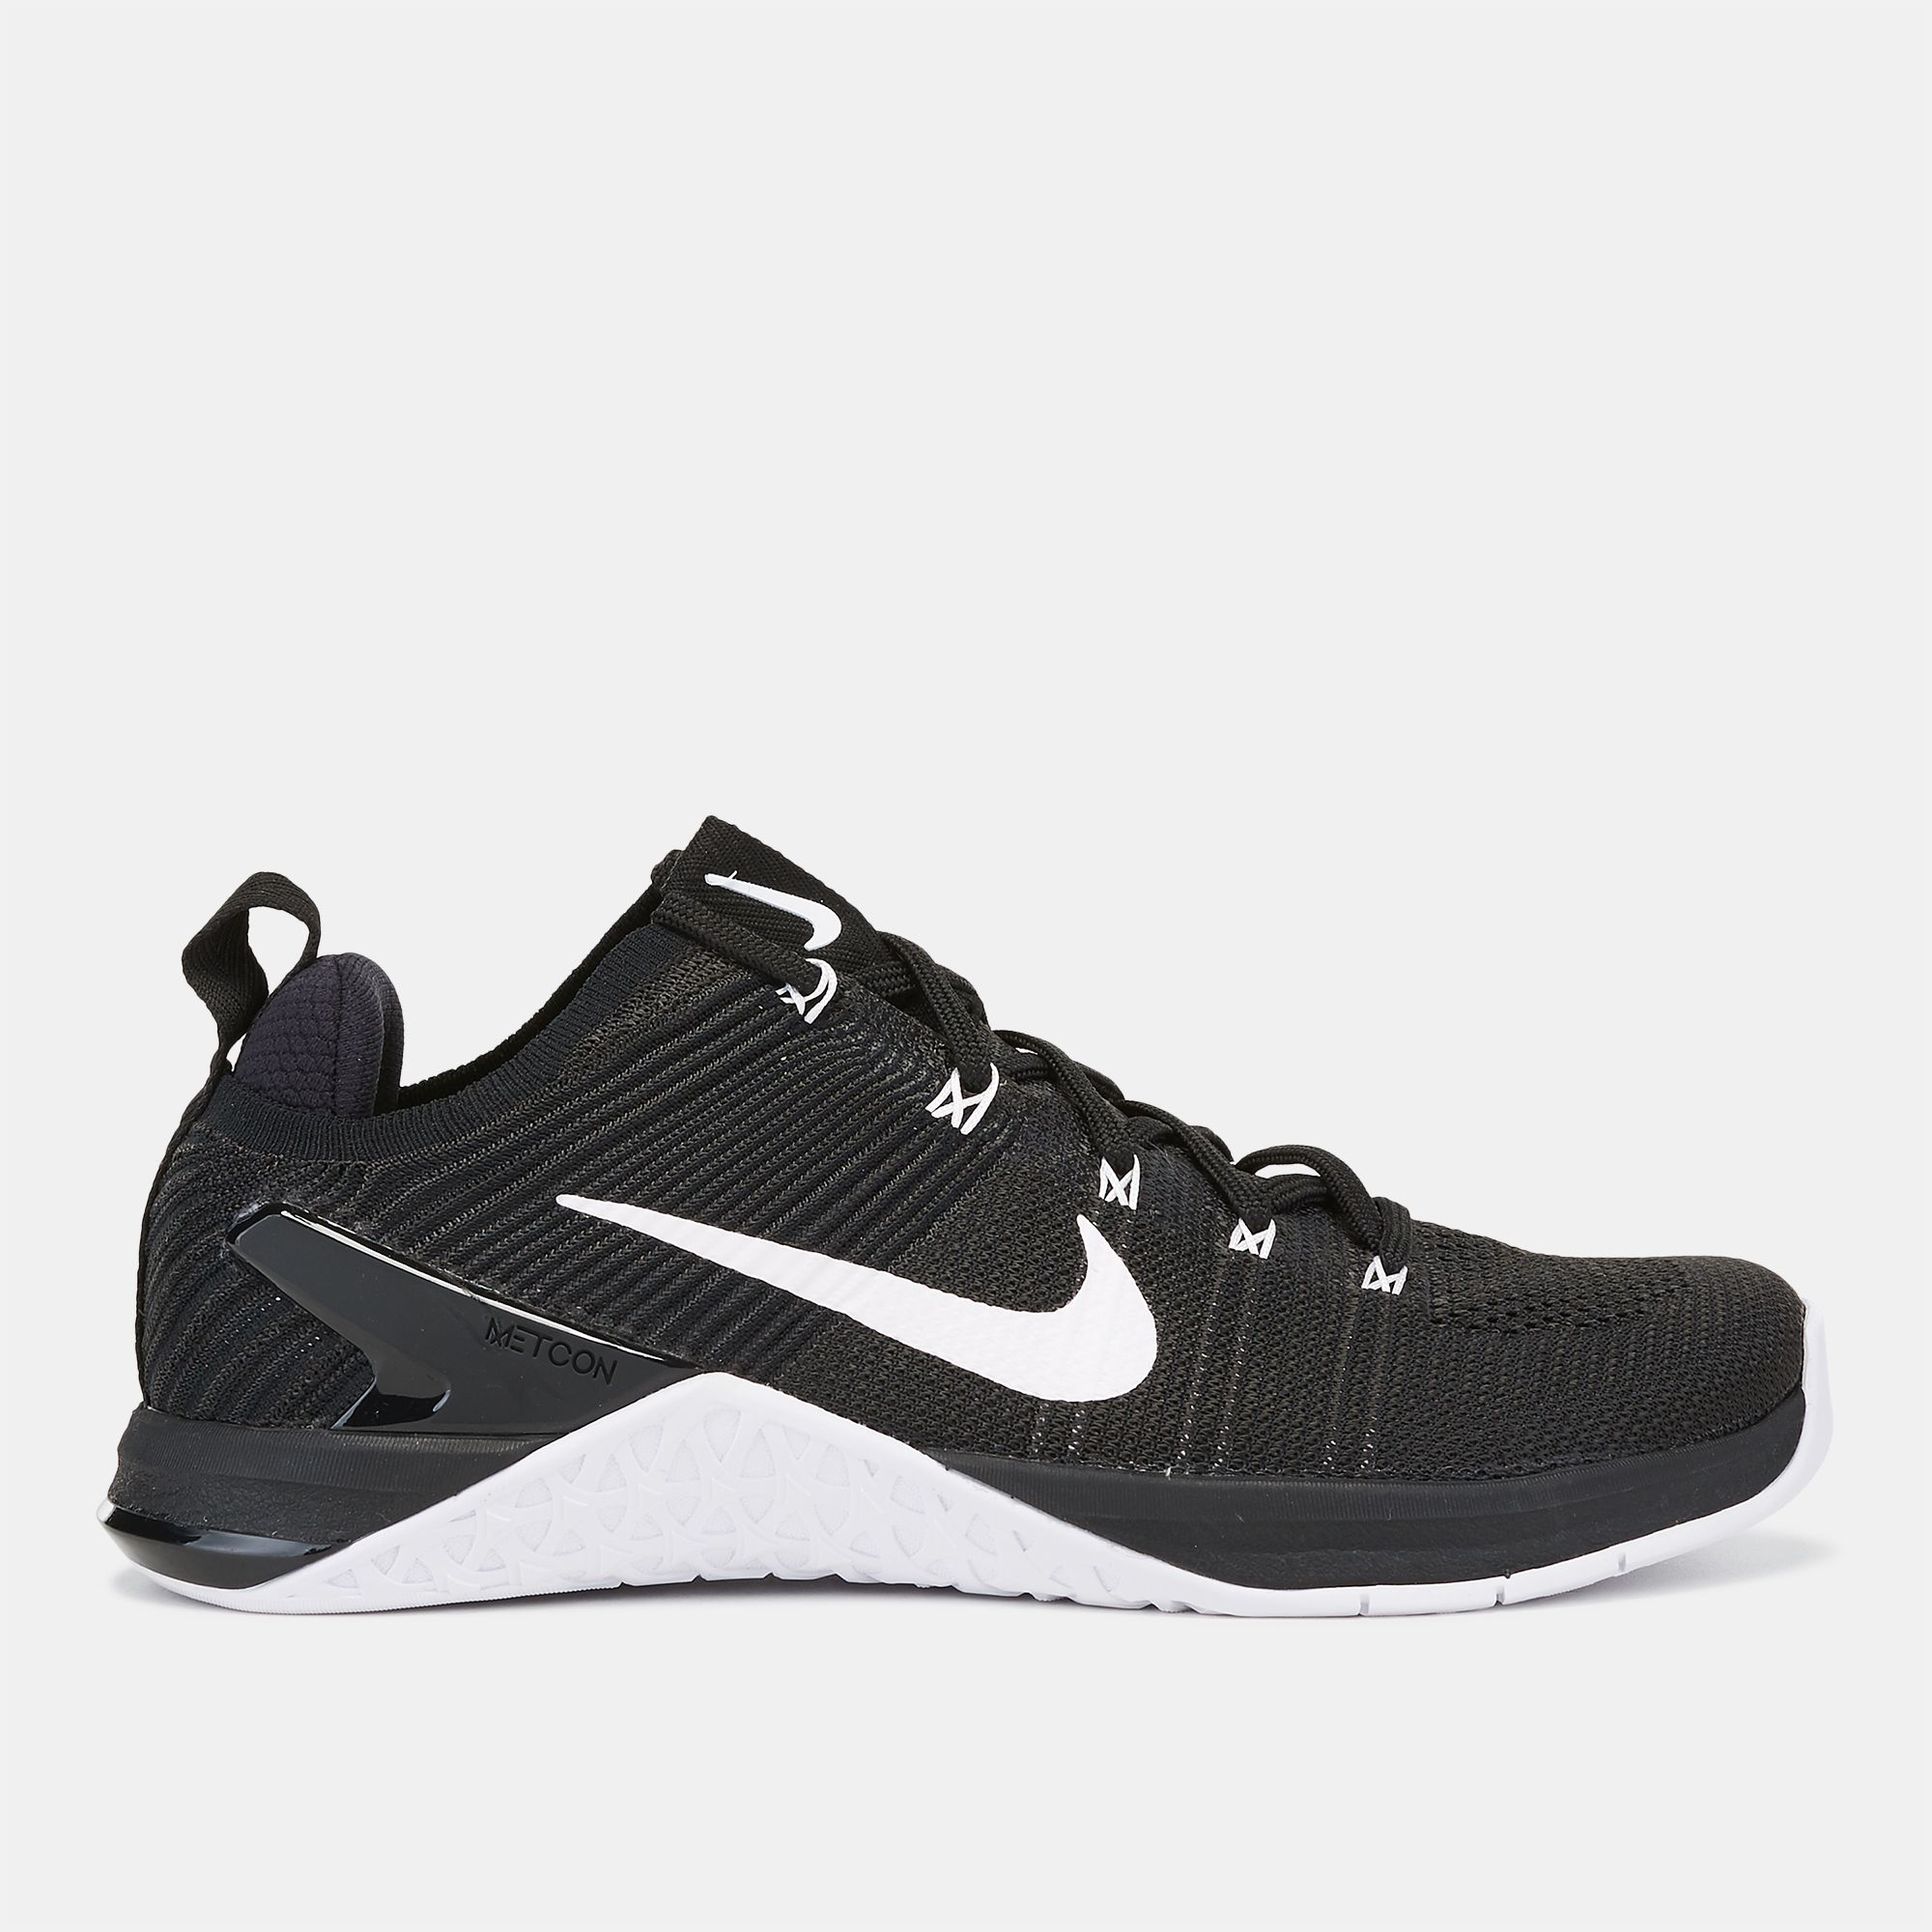 low priced a00f3 38222 Nike Metcon DSX Flyknit 2 Shoe | Sports Shoes | Shoes | Women's Sale ...